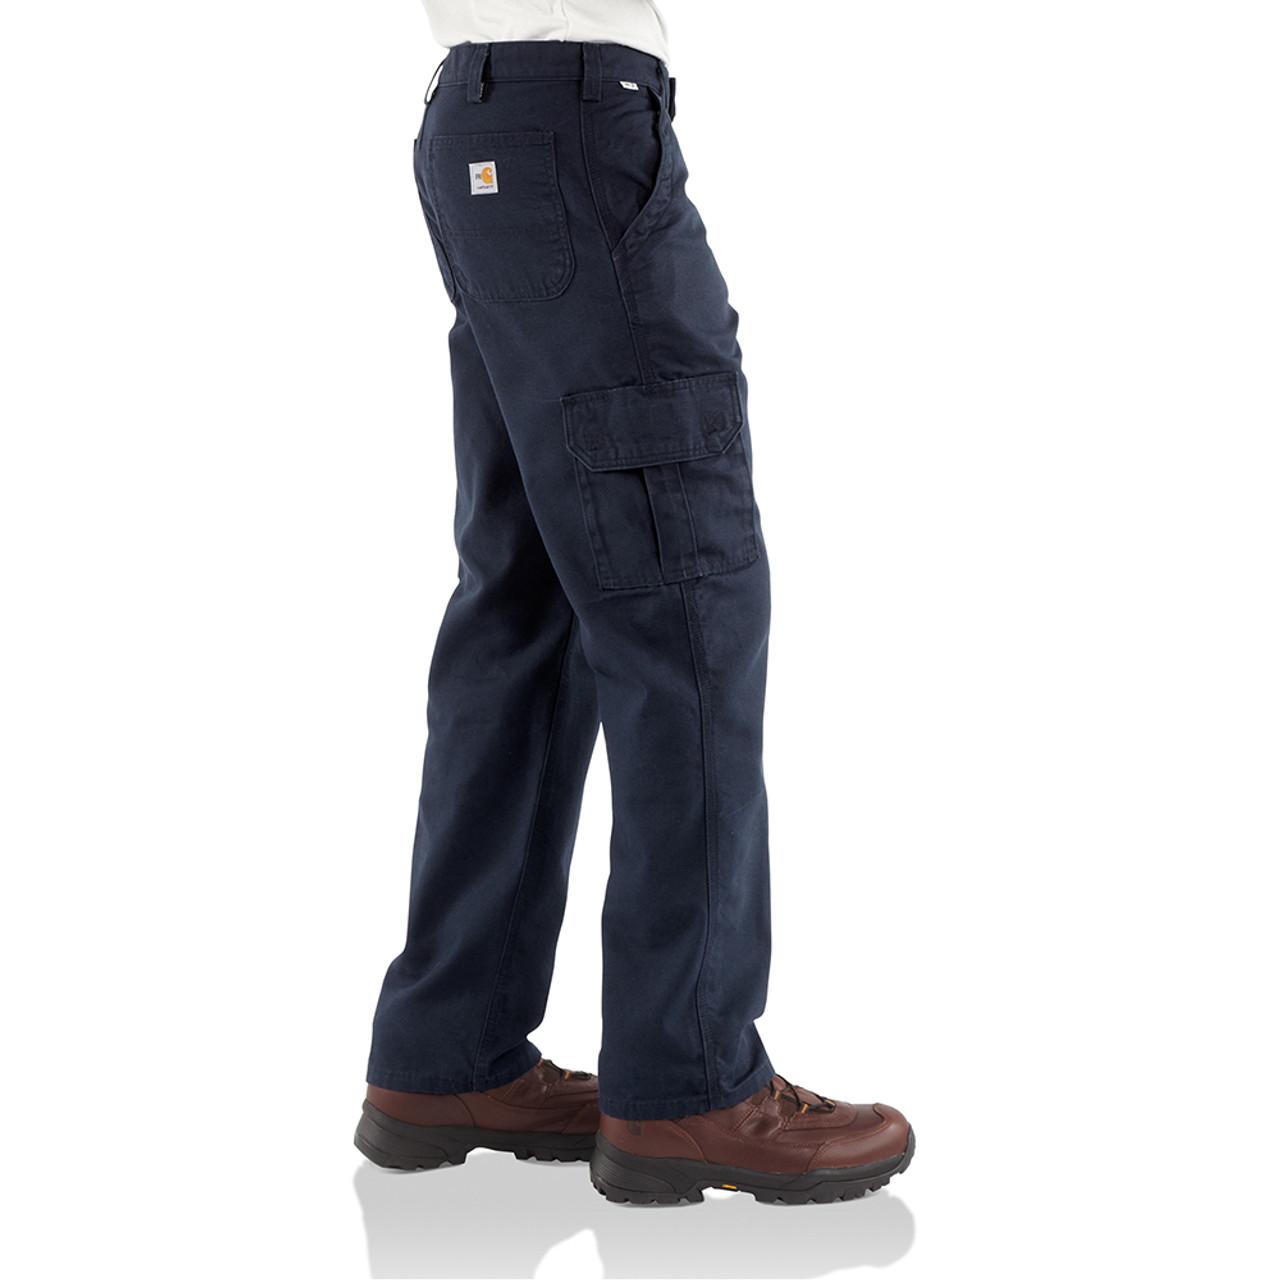 5b289dd0516c FRB240    · Carhartt 12 cal cm2 Men s Flame Resistant Canvas Cargo Pant -  FRB240 ...